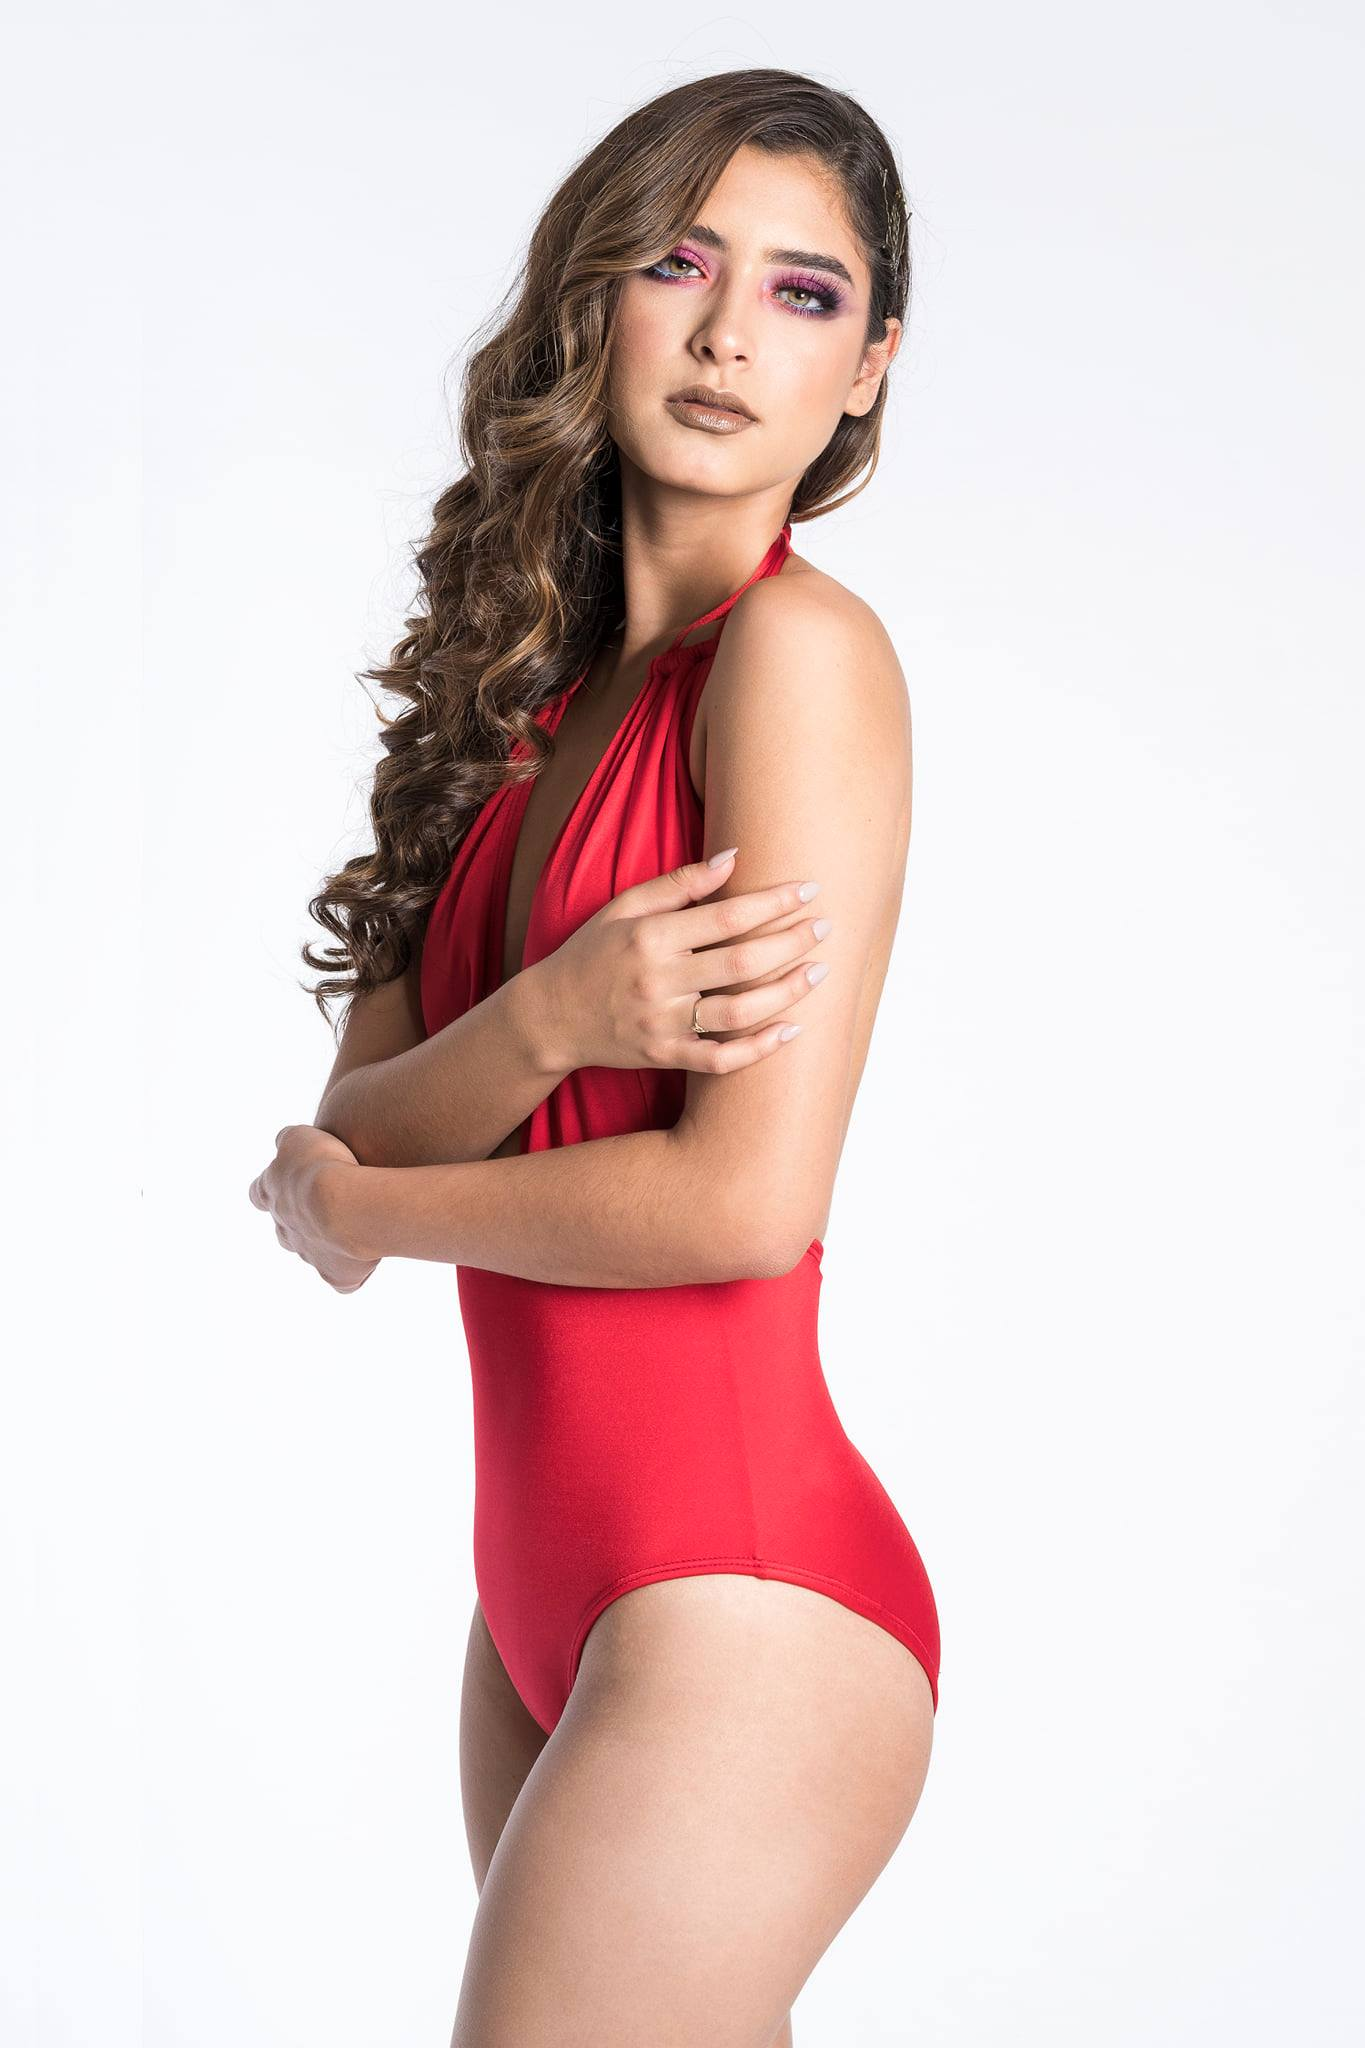 angela leon yuriar, miss grand mexico 2020. - Página 9 Pb0wk10